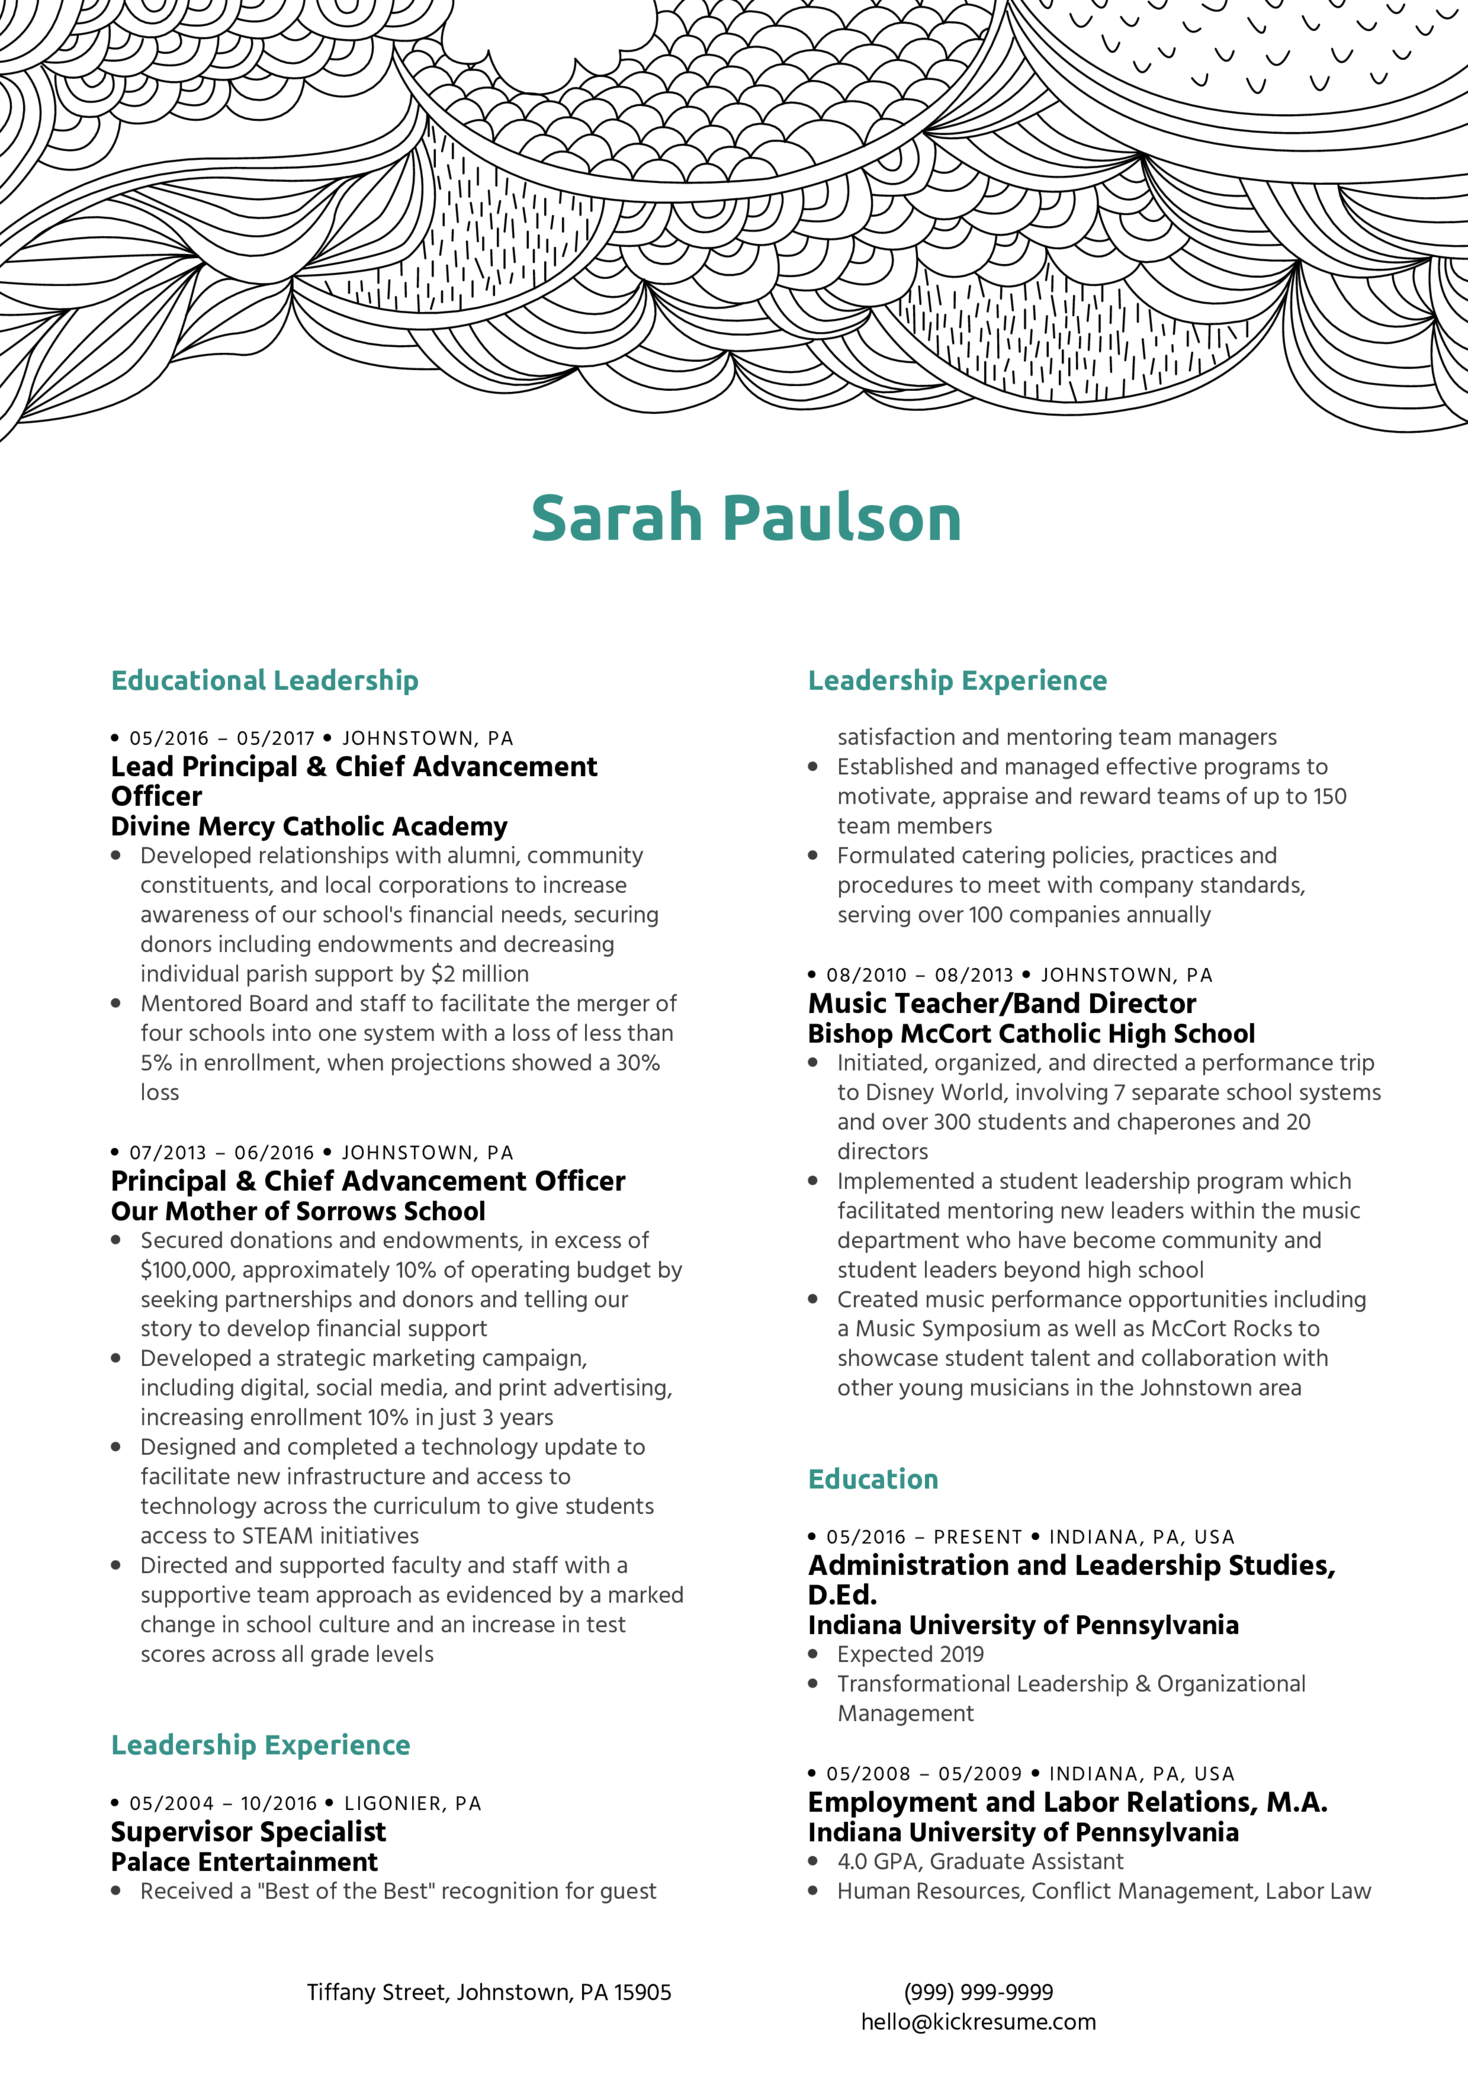 Administrative Manager Resume Sample (parte 1)